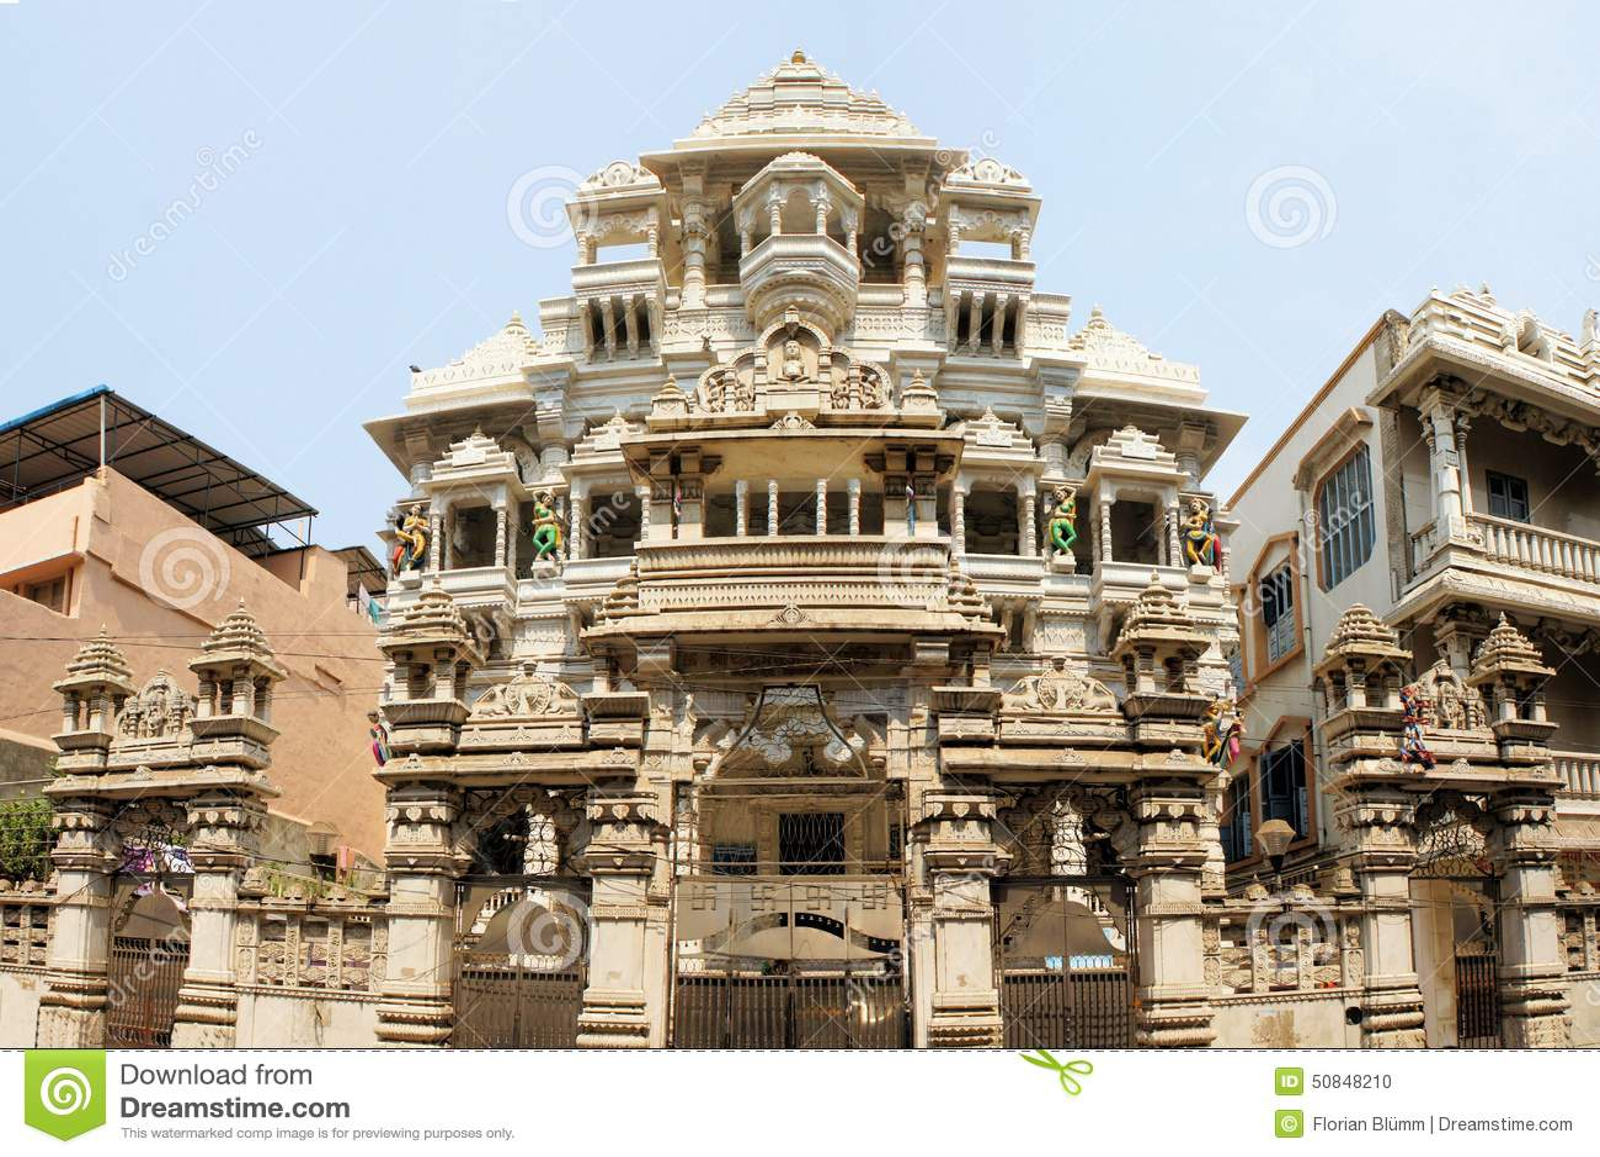 Jaintempel in Chennai, India